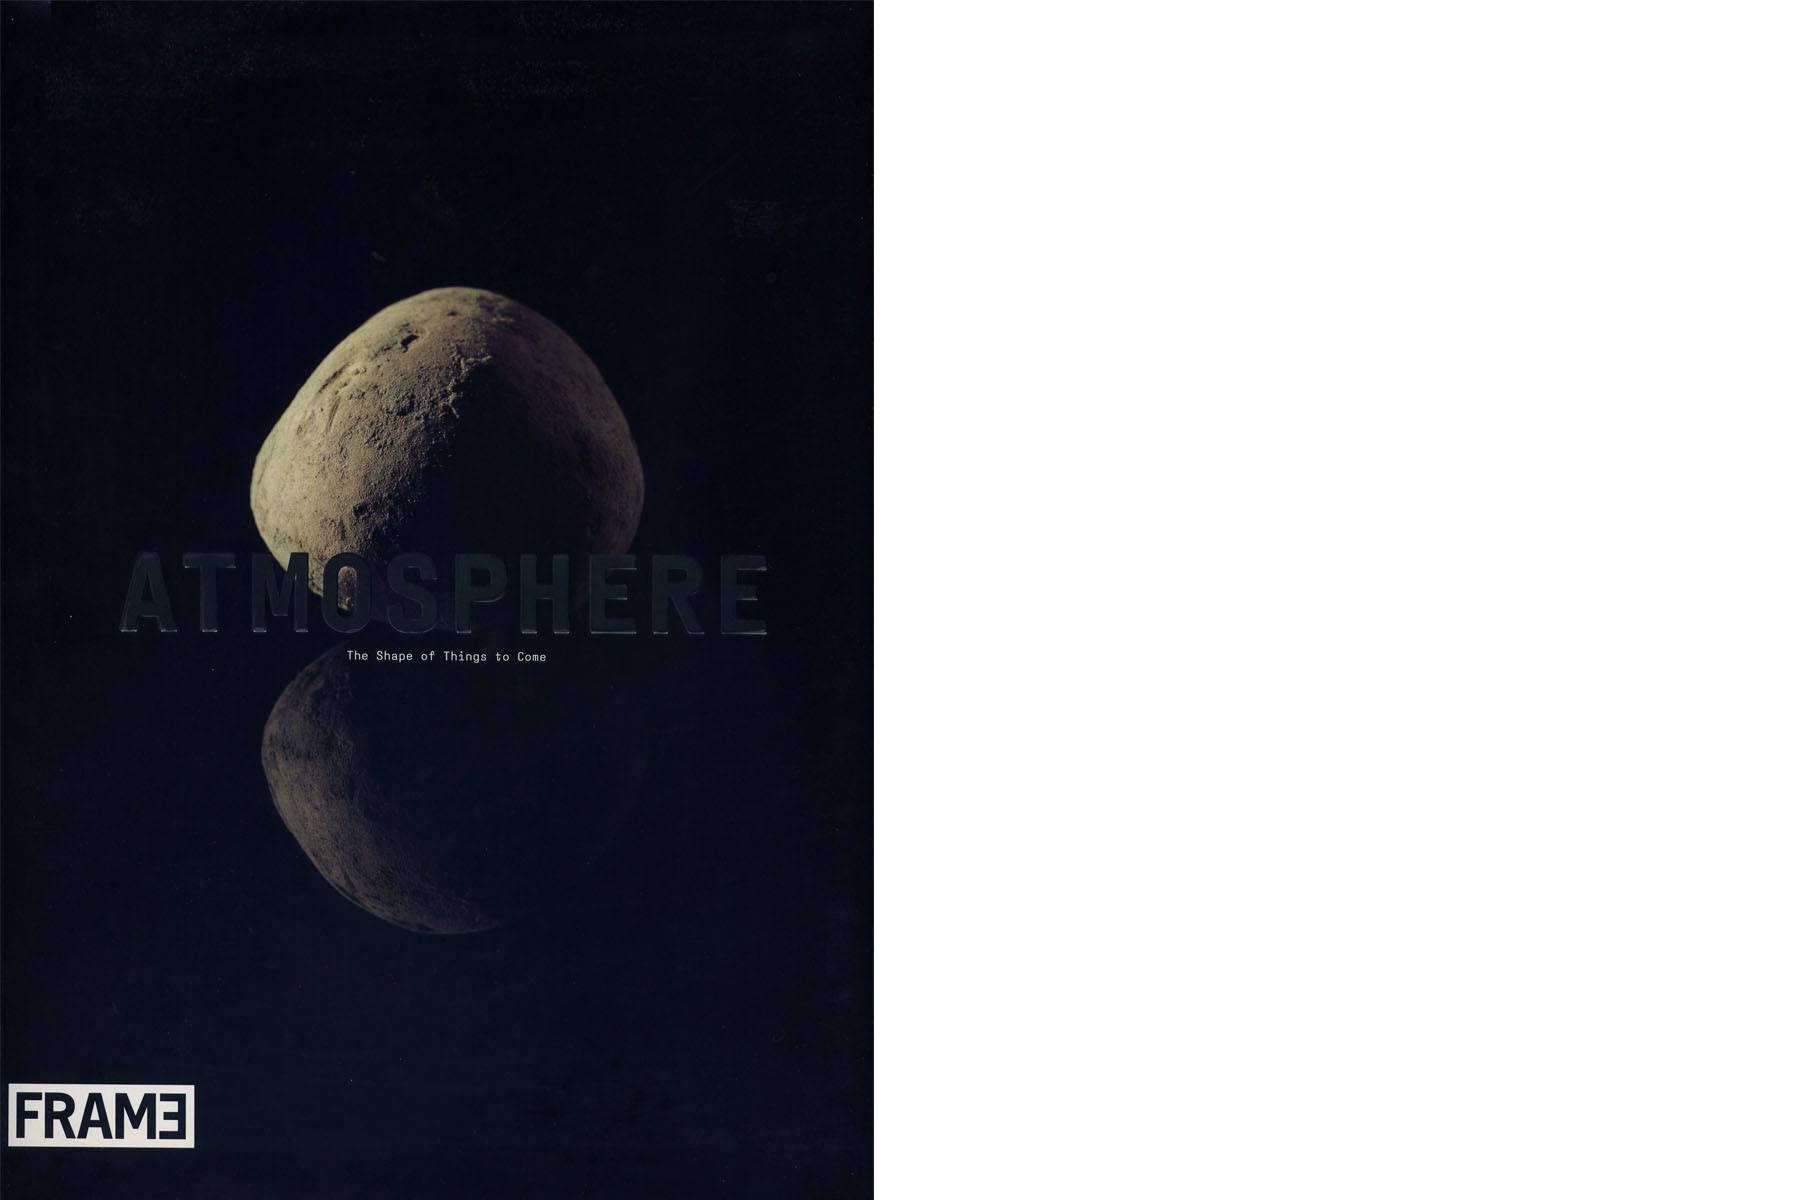 Atmosphere / Frame